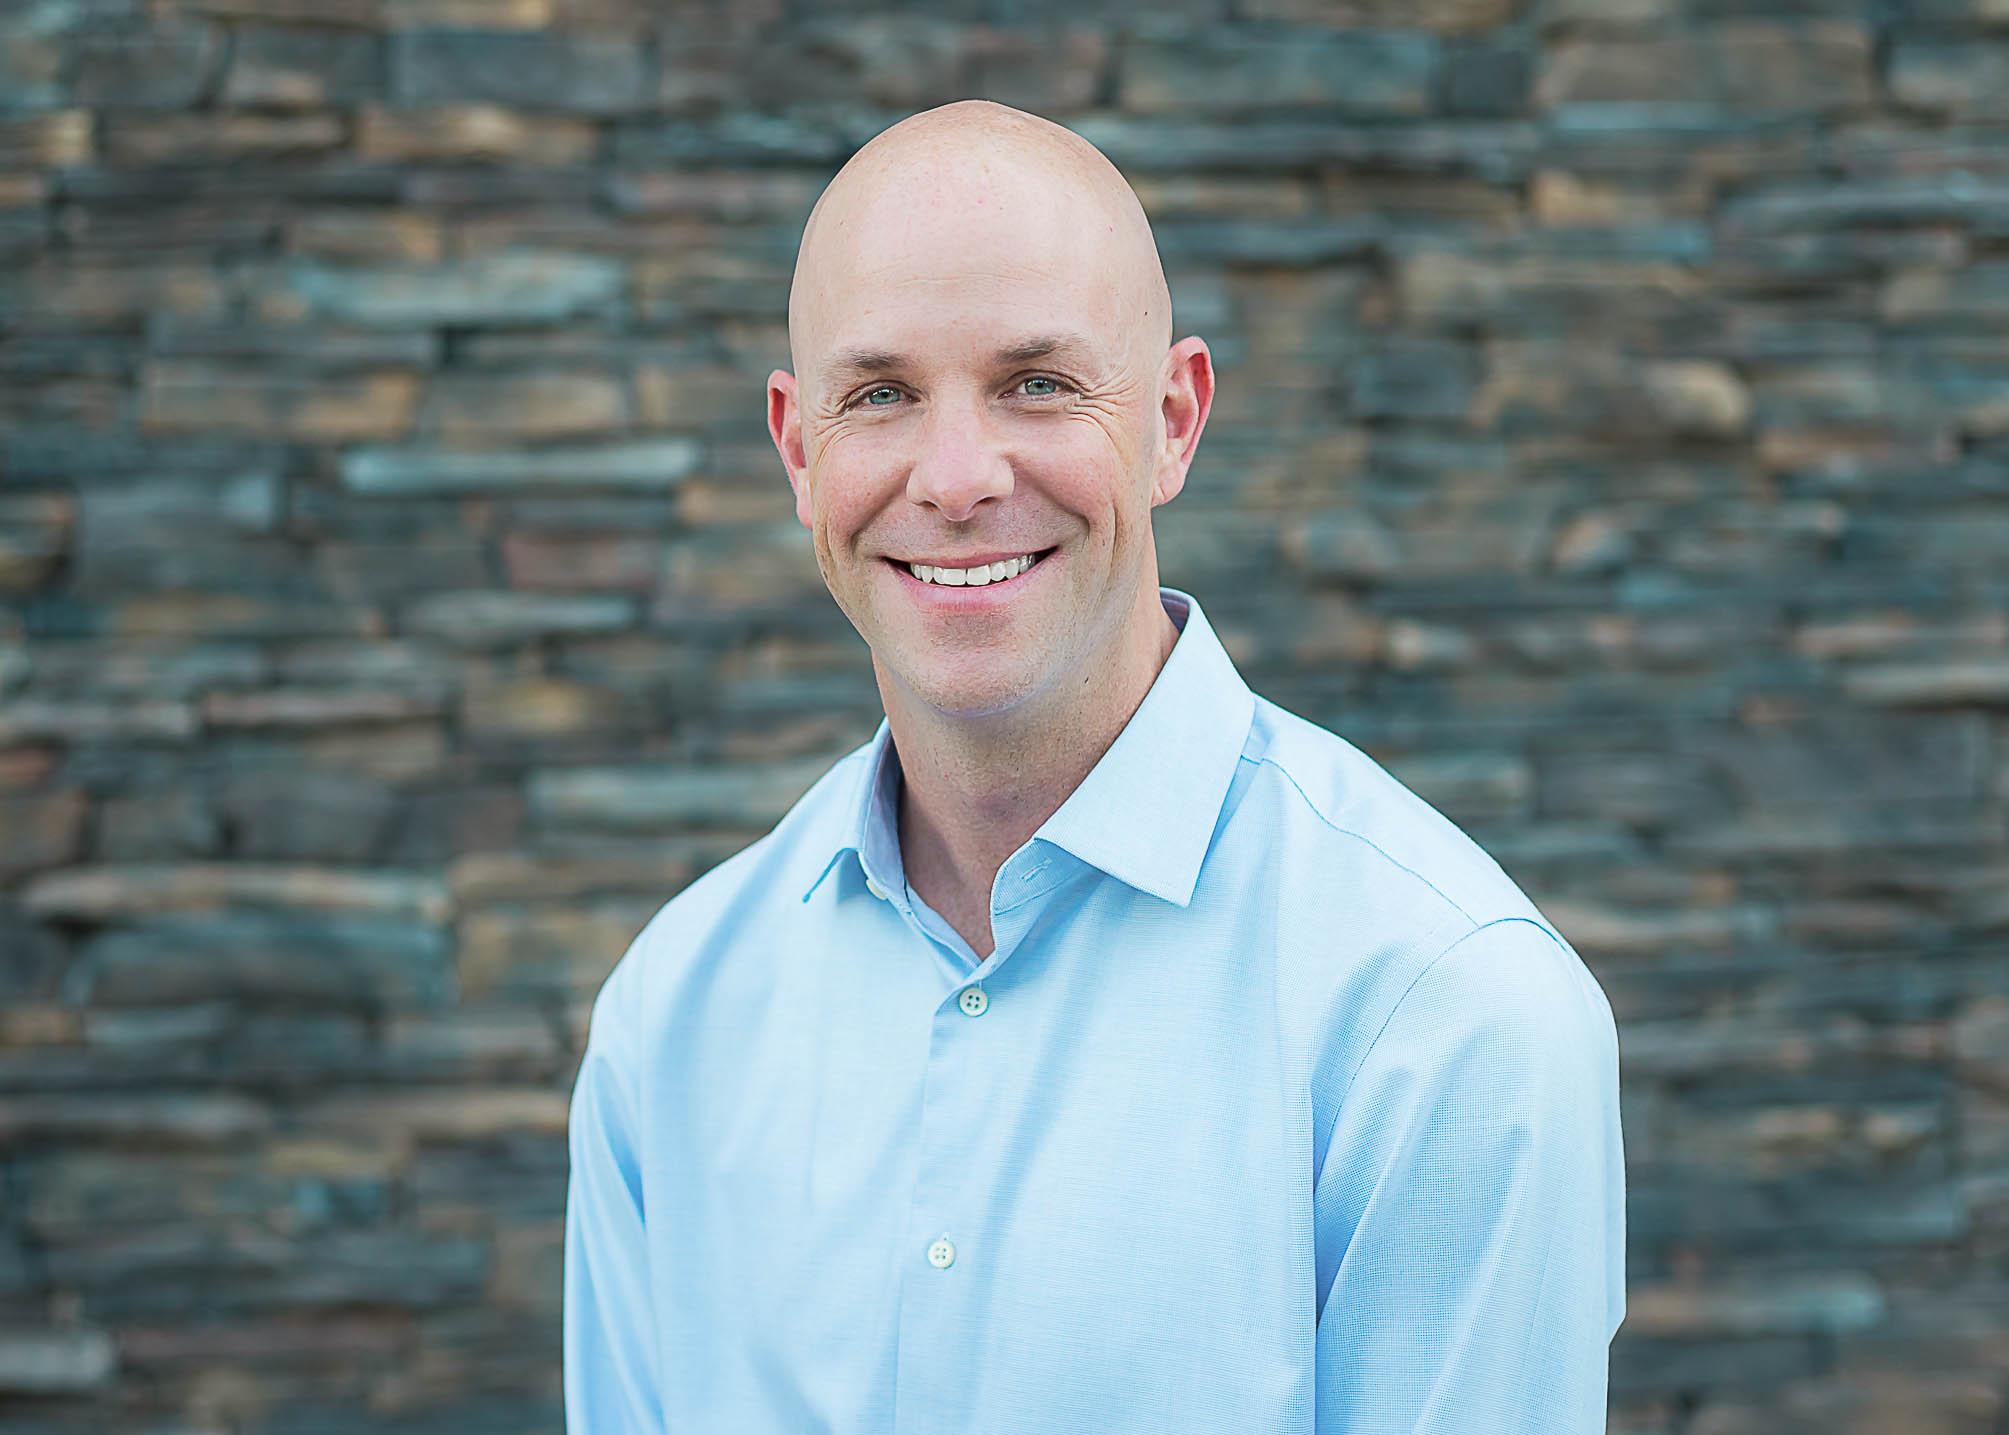 Jason Brinkley - Lead PastorJason@impactmycity.church